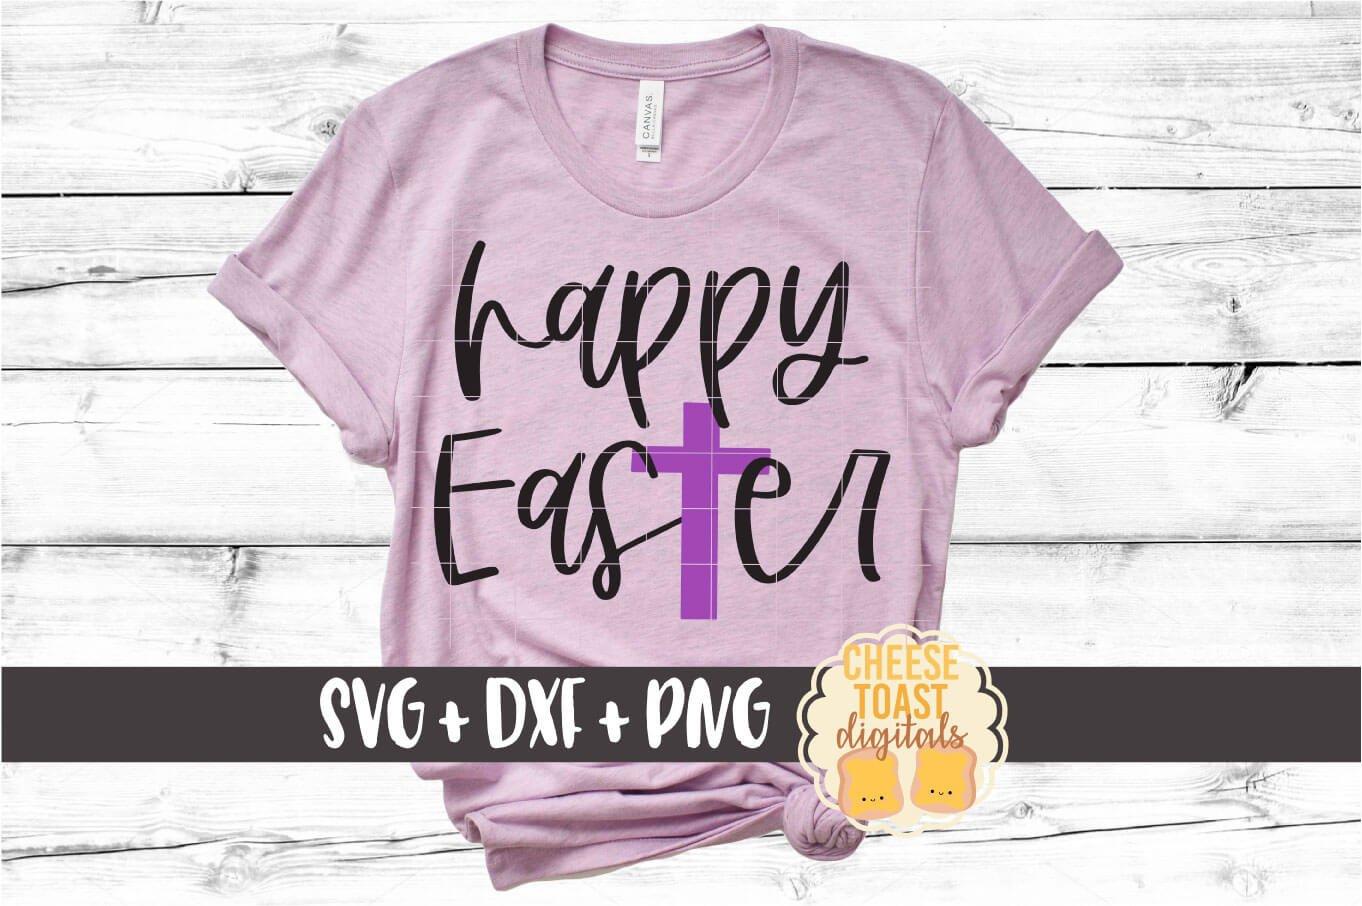 Happy Easter Christian Cross Svg Png Dxf Cut Files 492602 Cut Files Design Bundles